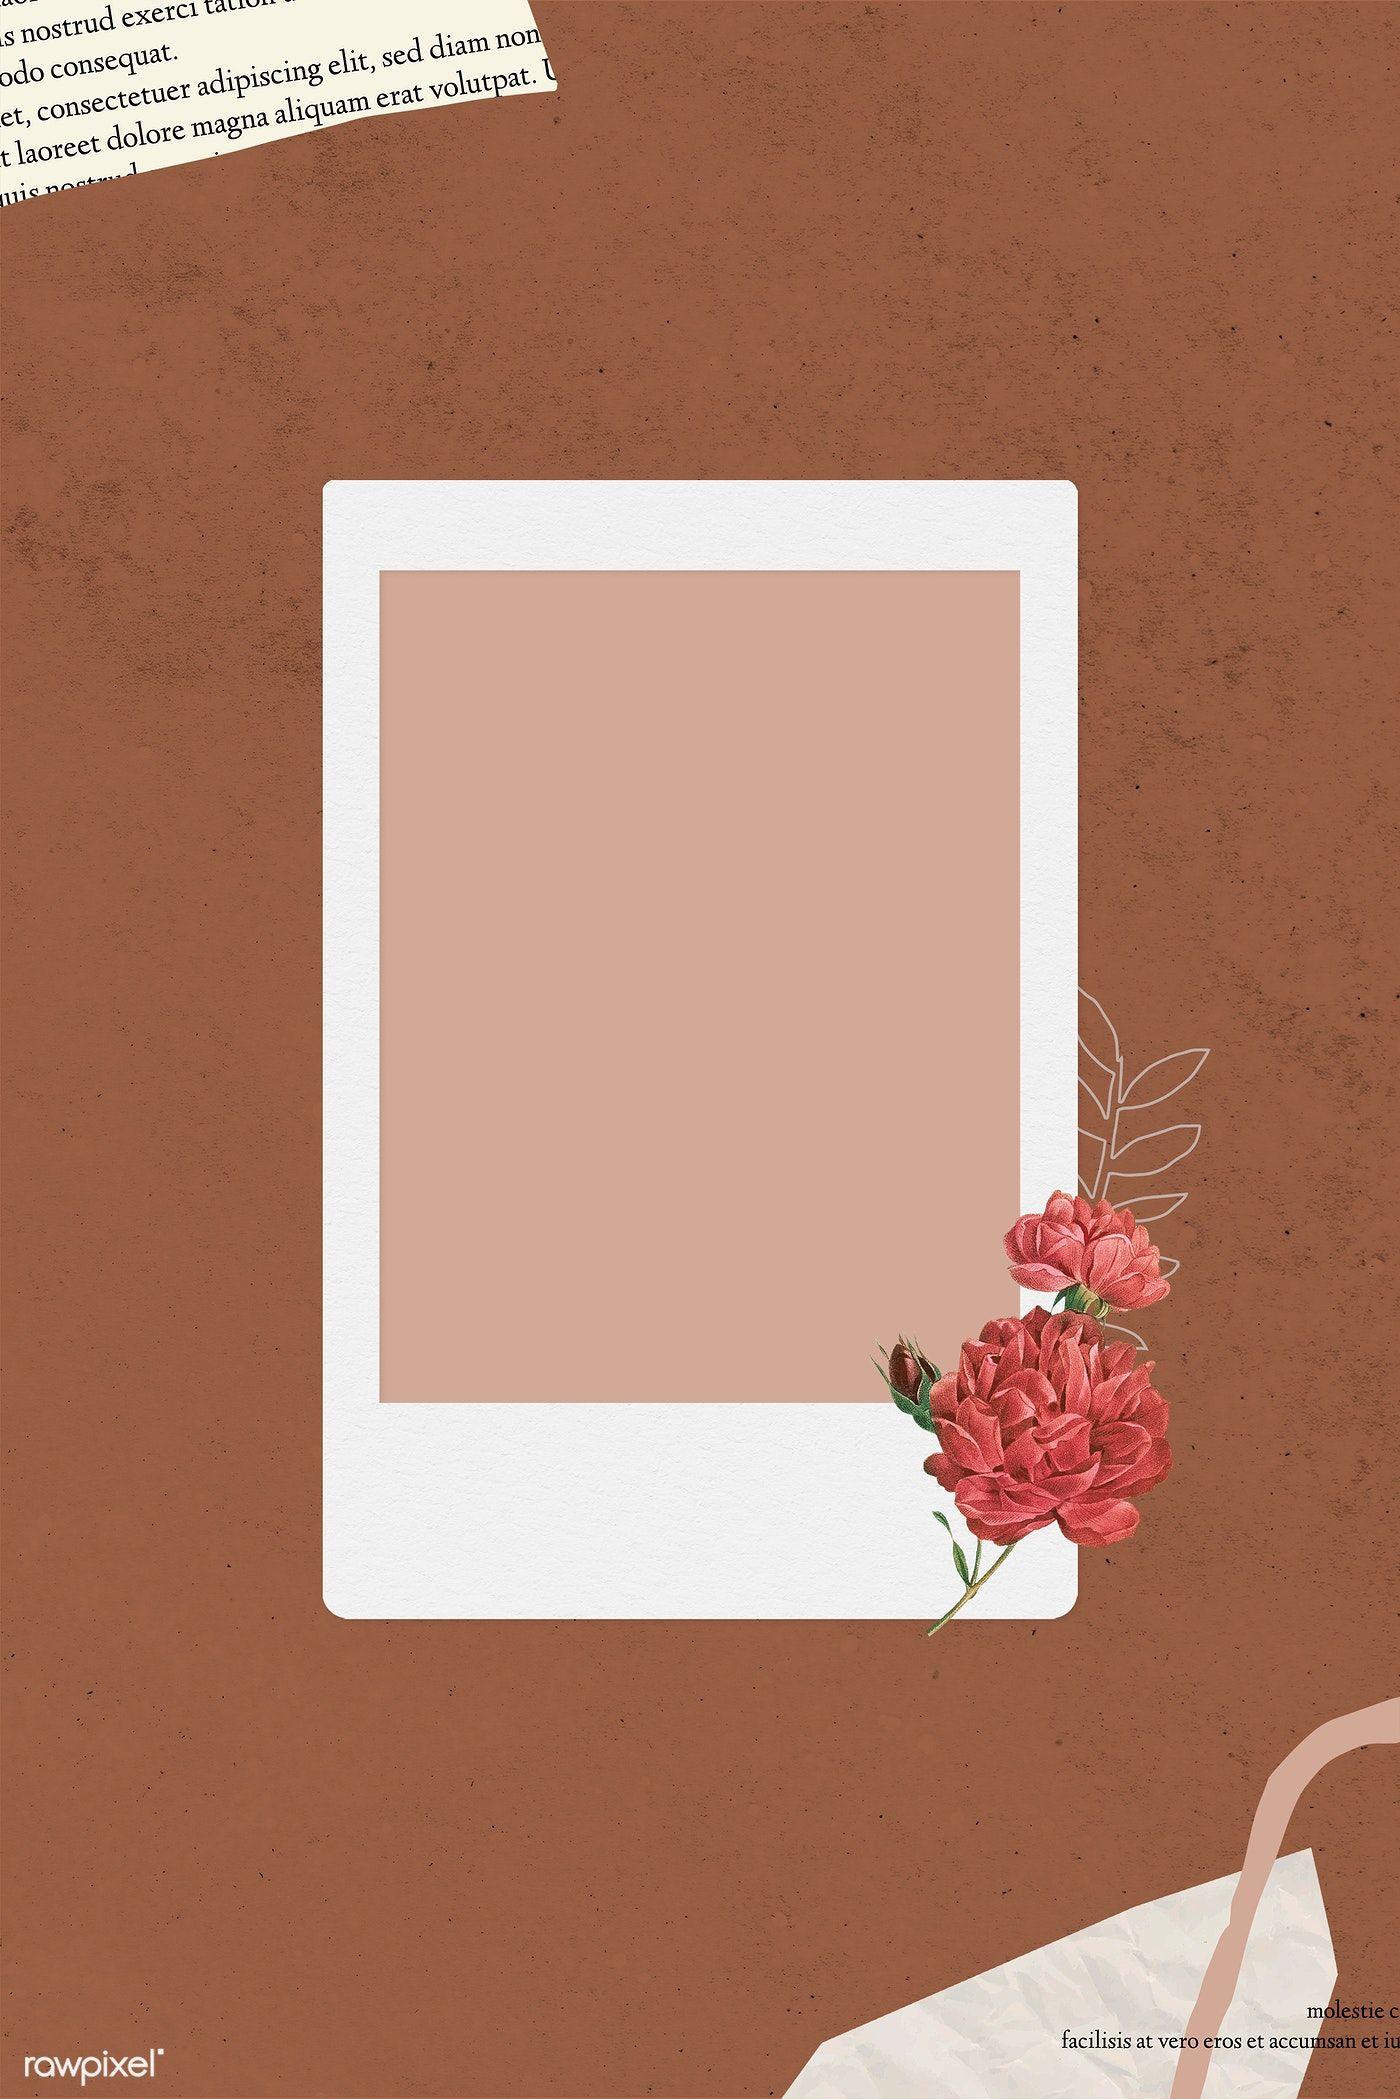 Download Premium Illustration Of Blank Collage Photo Frame Template On Instagram Photo Frame Photo Collage Template Frame Template